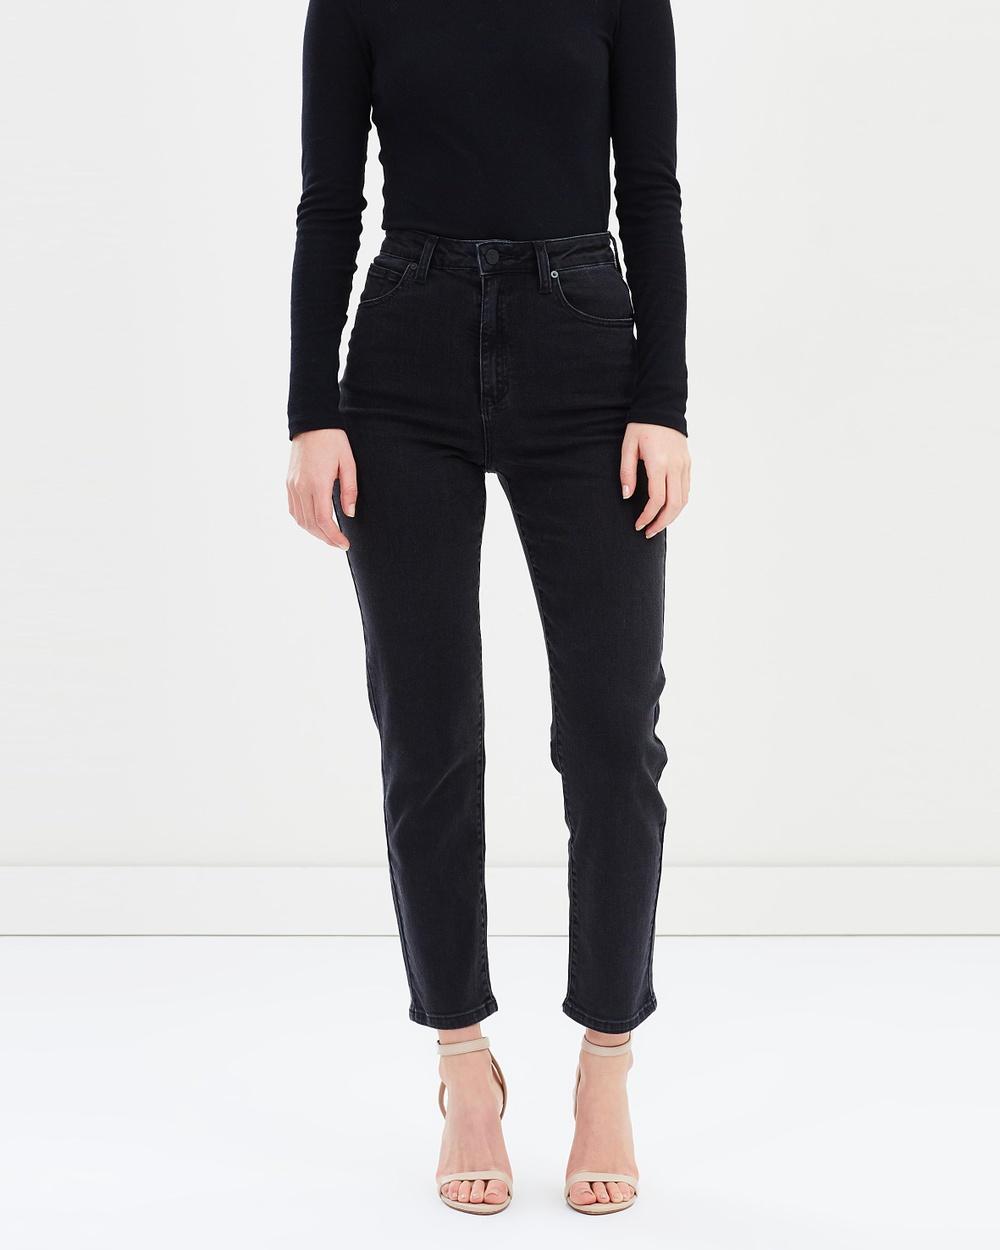 Abrand A '94 High Slim Jeans 90210